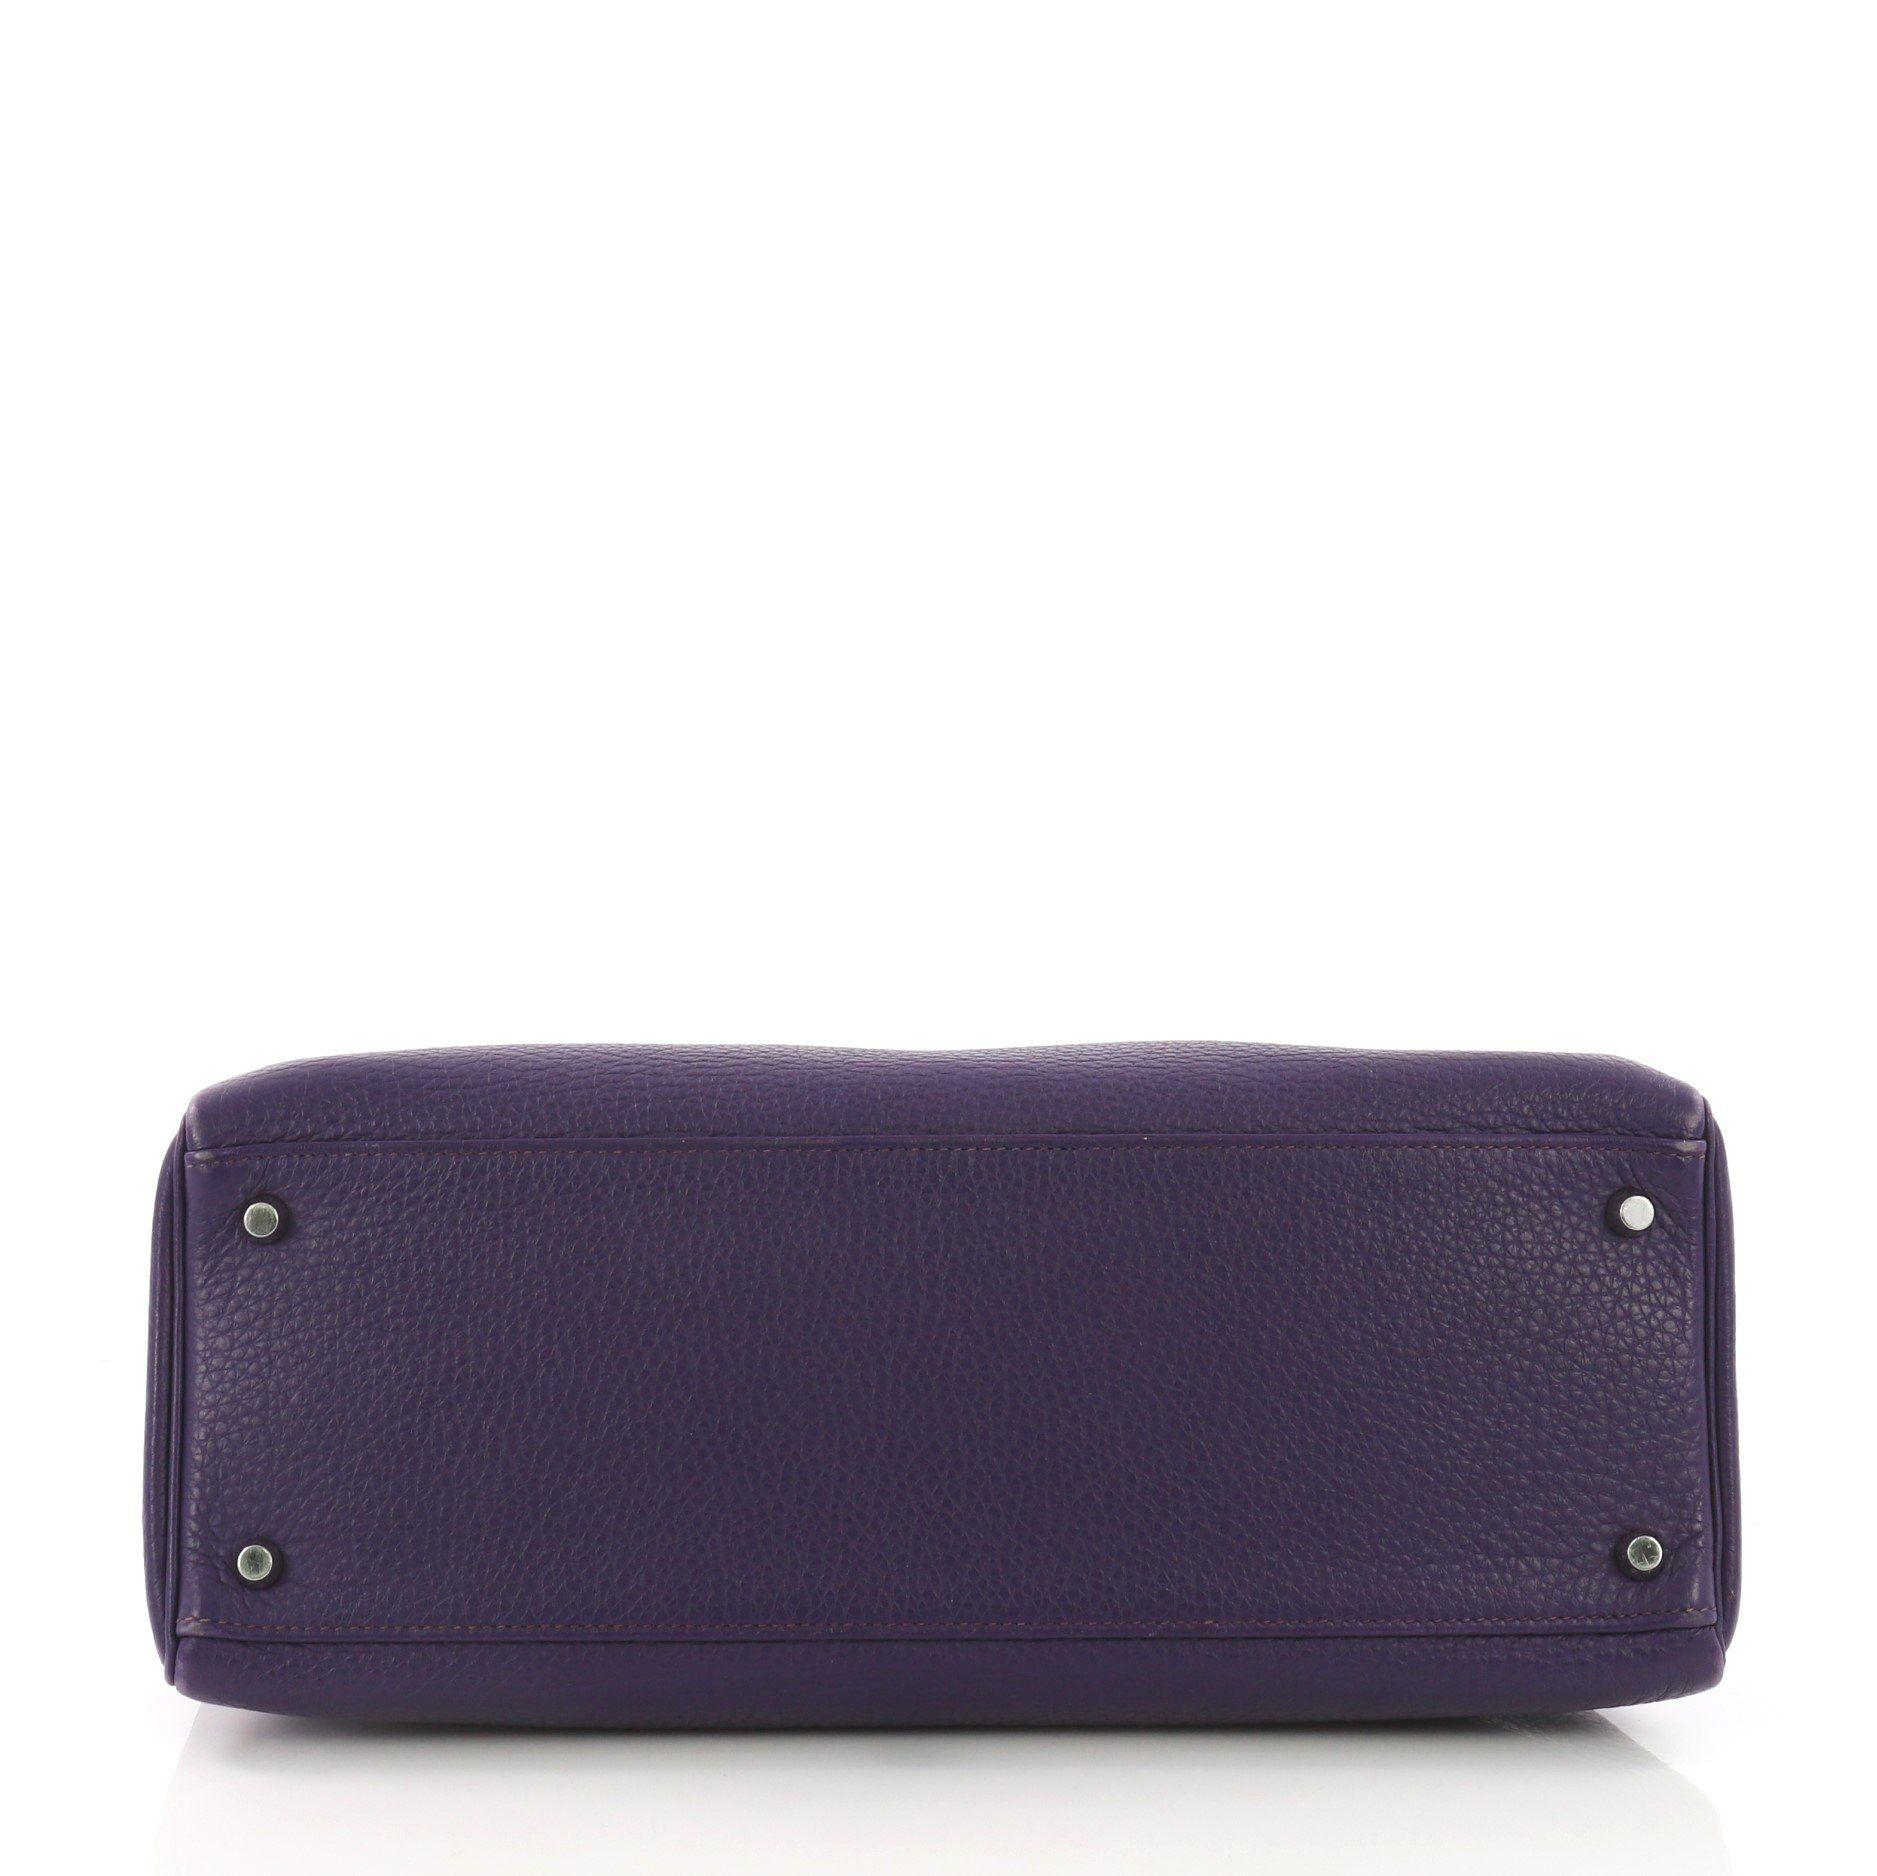 603f1df3a81a Hermès - Purple Pre Owned Kelly Handbag Iris Togo With Palladium Hardware 35  - Lyst. View fullscreen